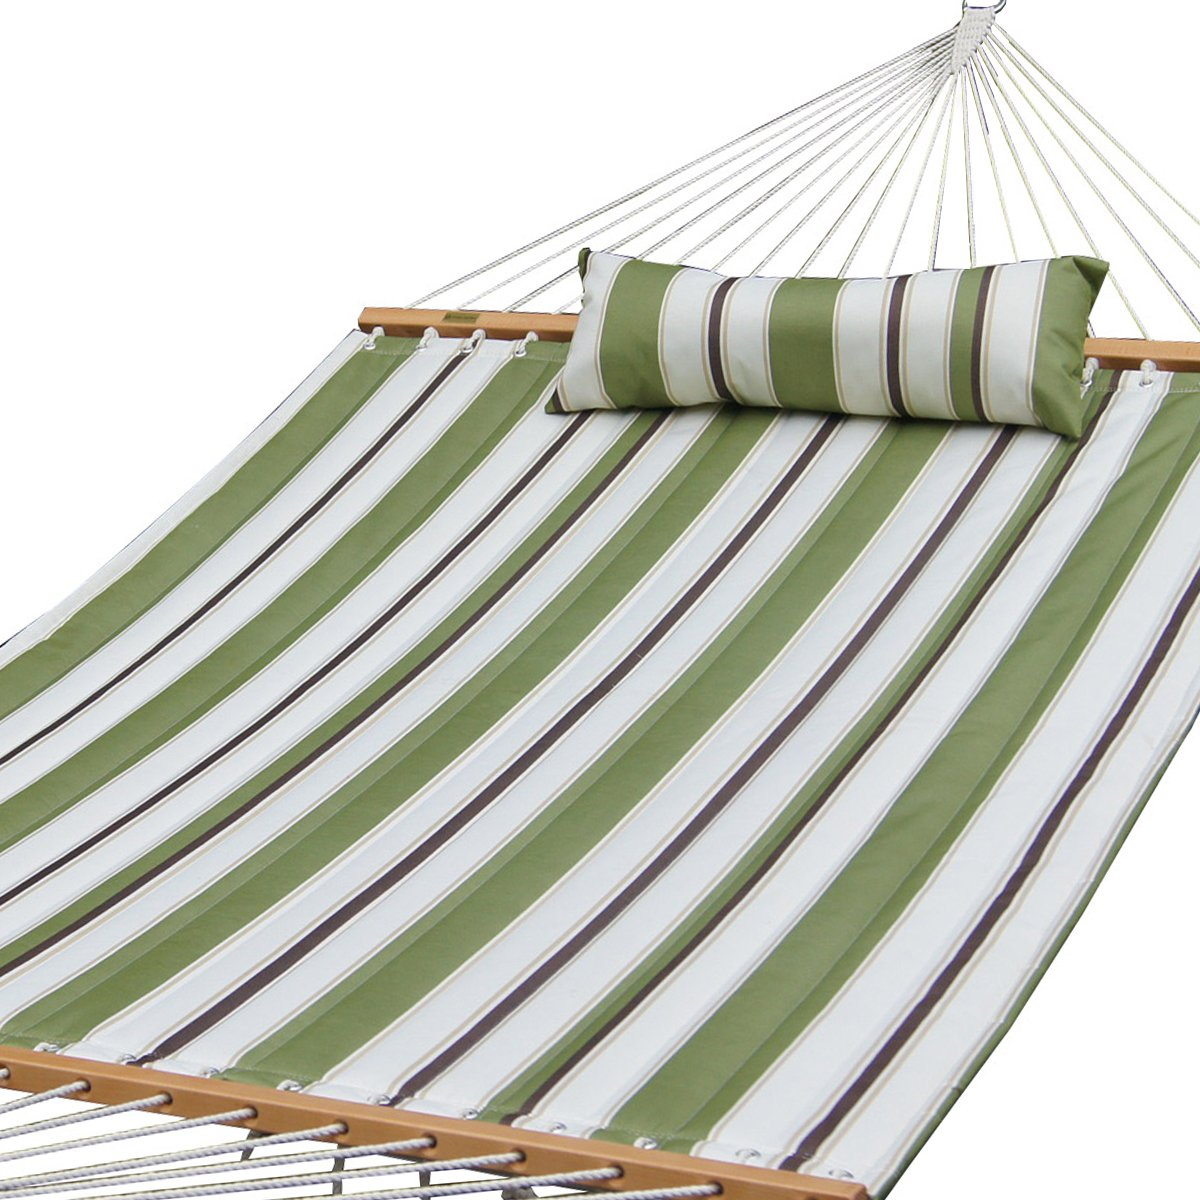 PG PRIME GARDENPrime Garden Quilted Fabric Hammock W/Pillow, Hardwood Spreader Bars, 2 People, Olive/White Stripe